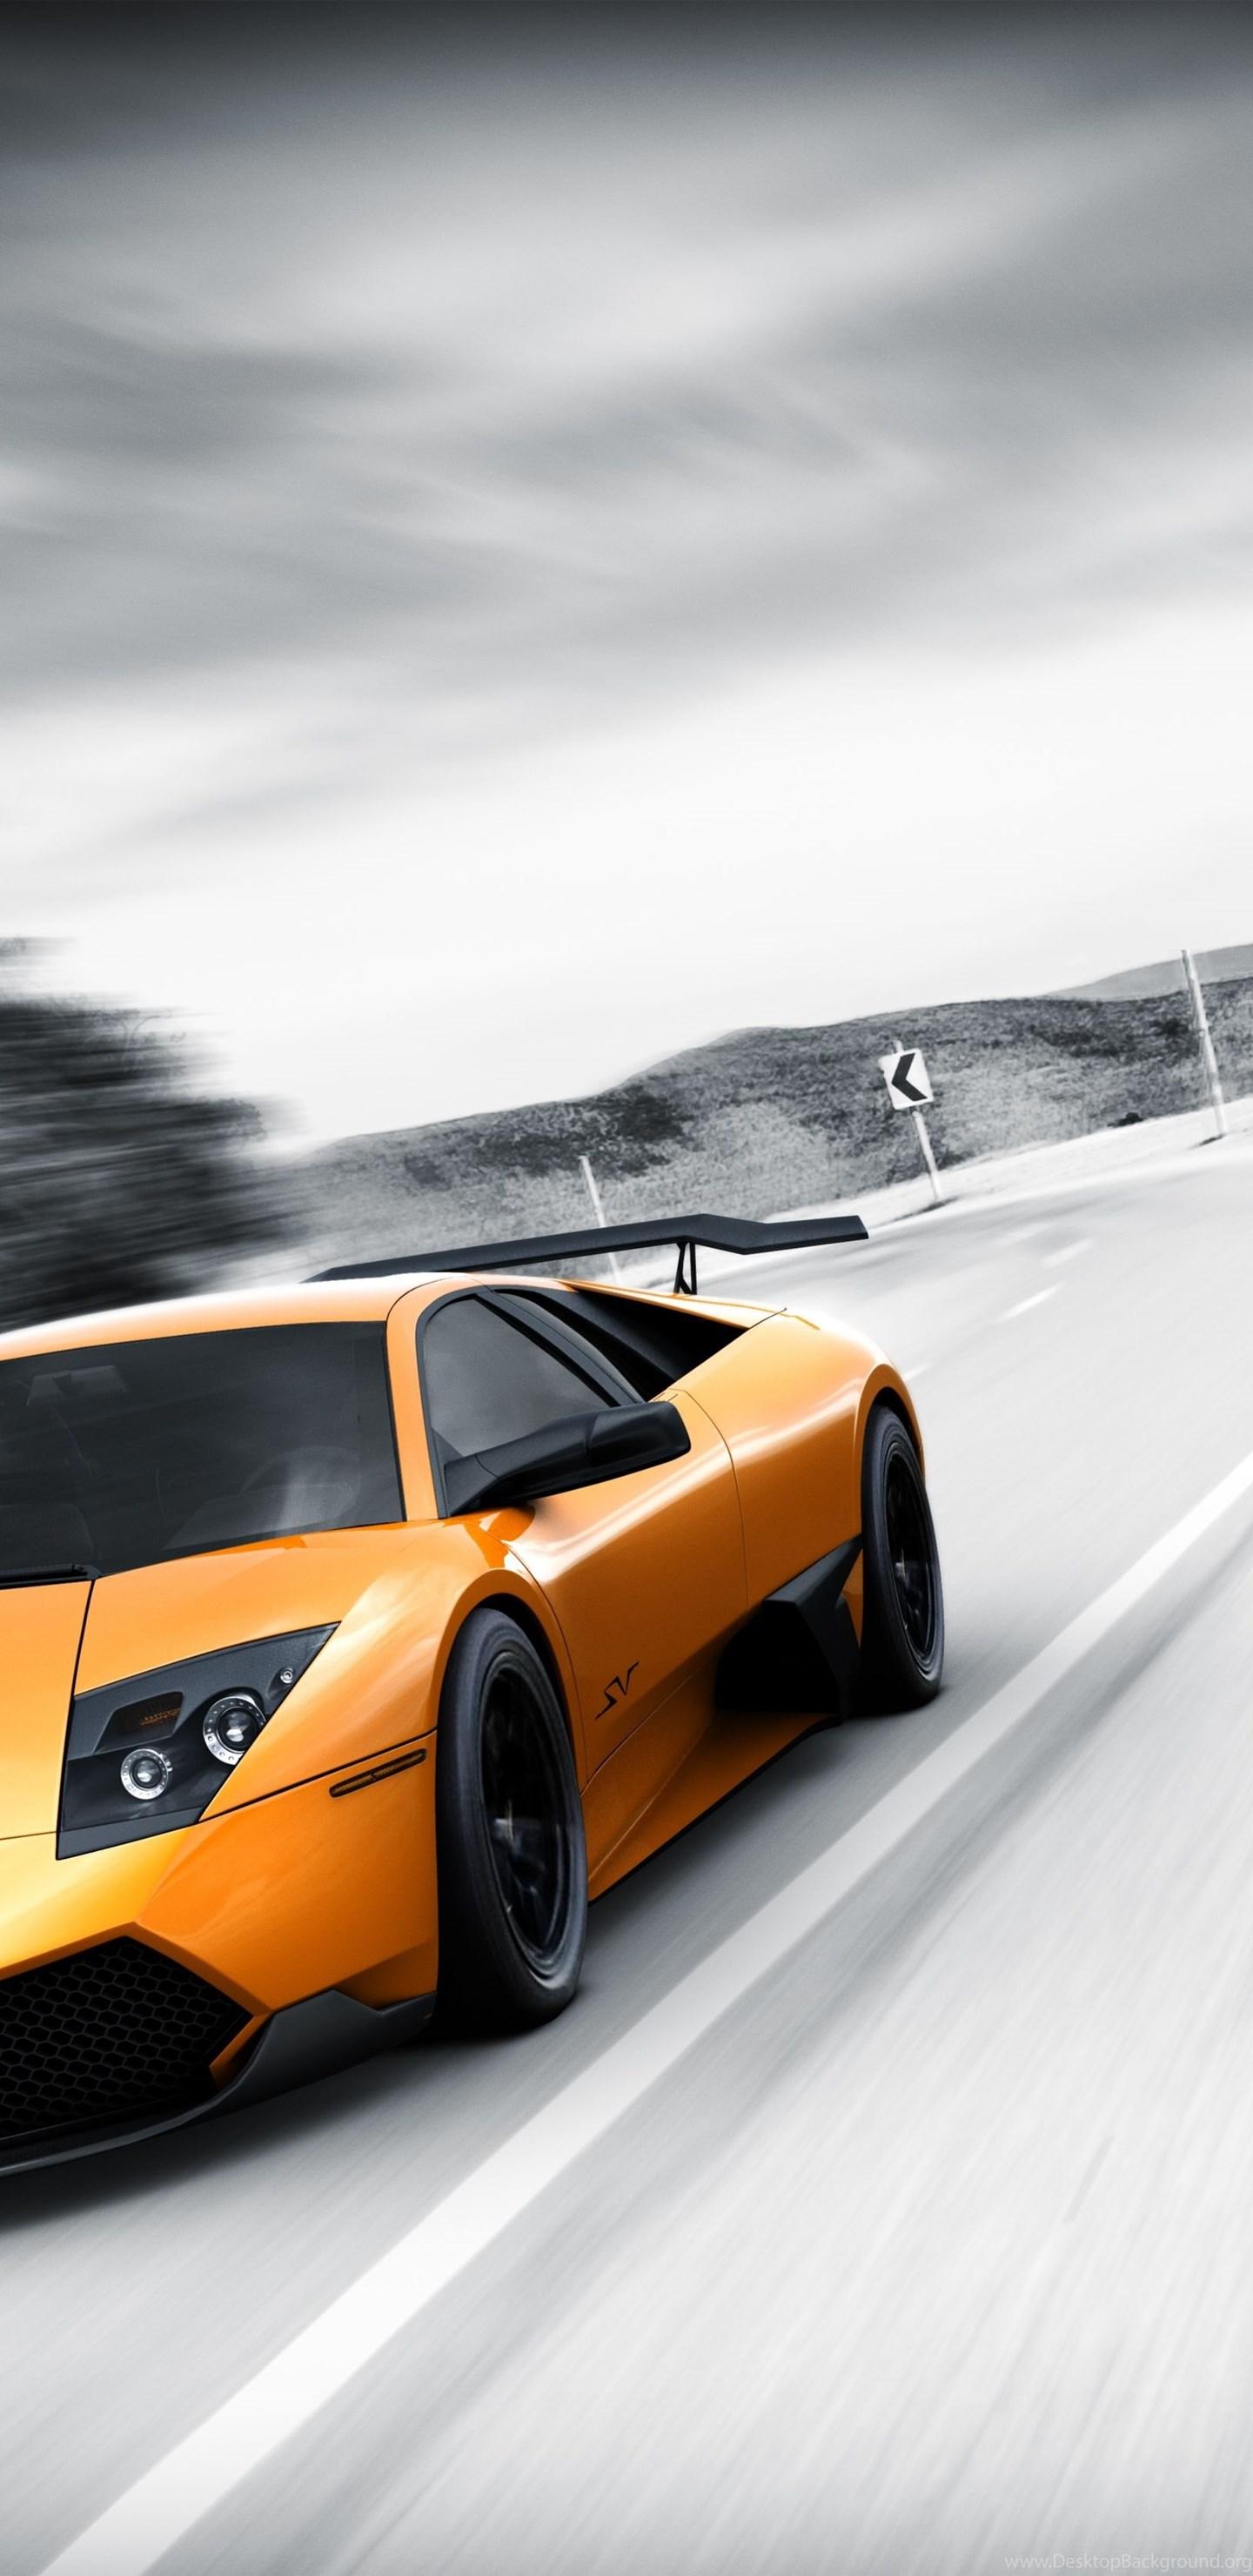 Car Wallpapers Hd Download Desktop Background